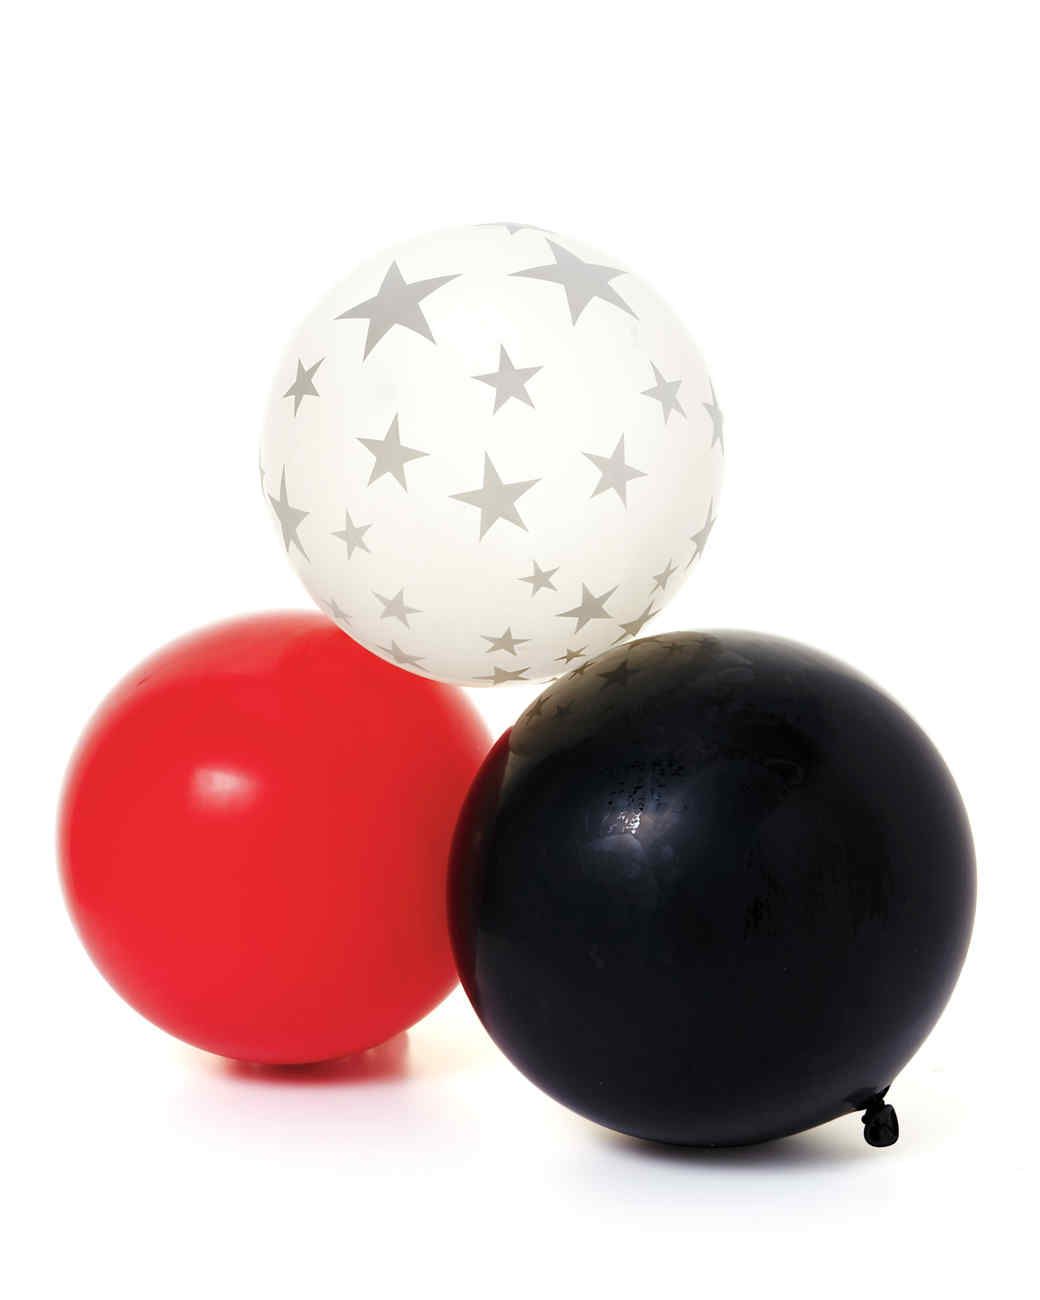 balloons-b-012-mld109144.jpg